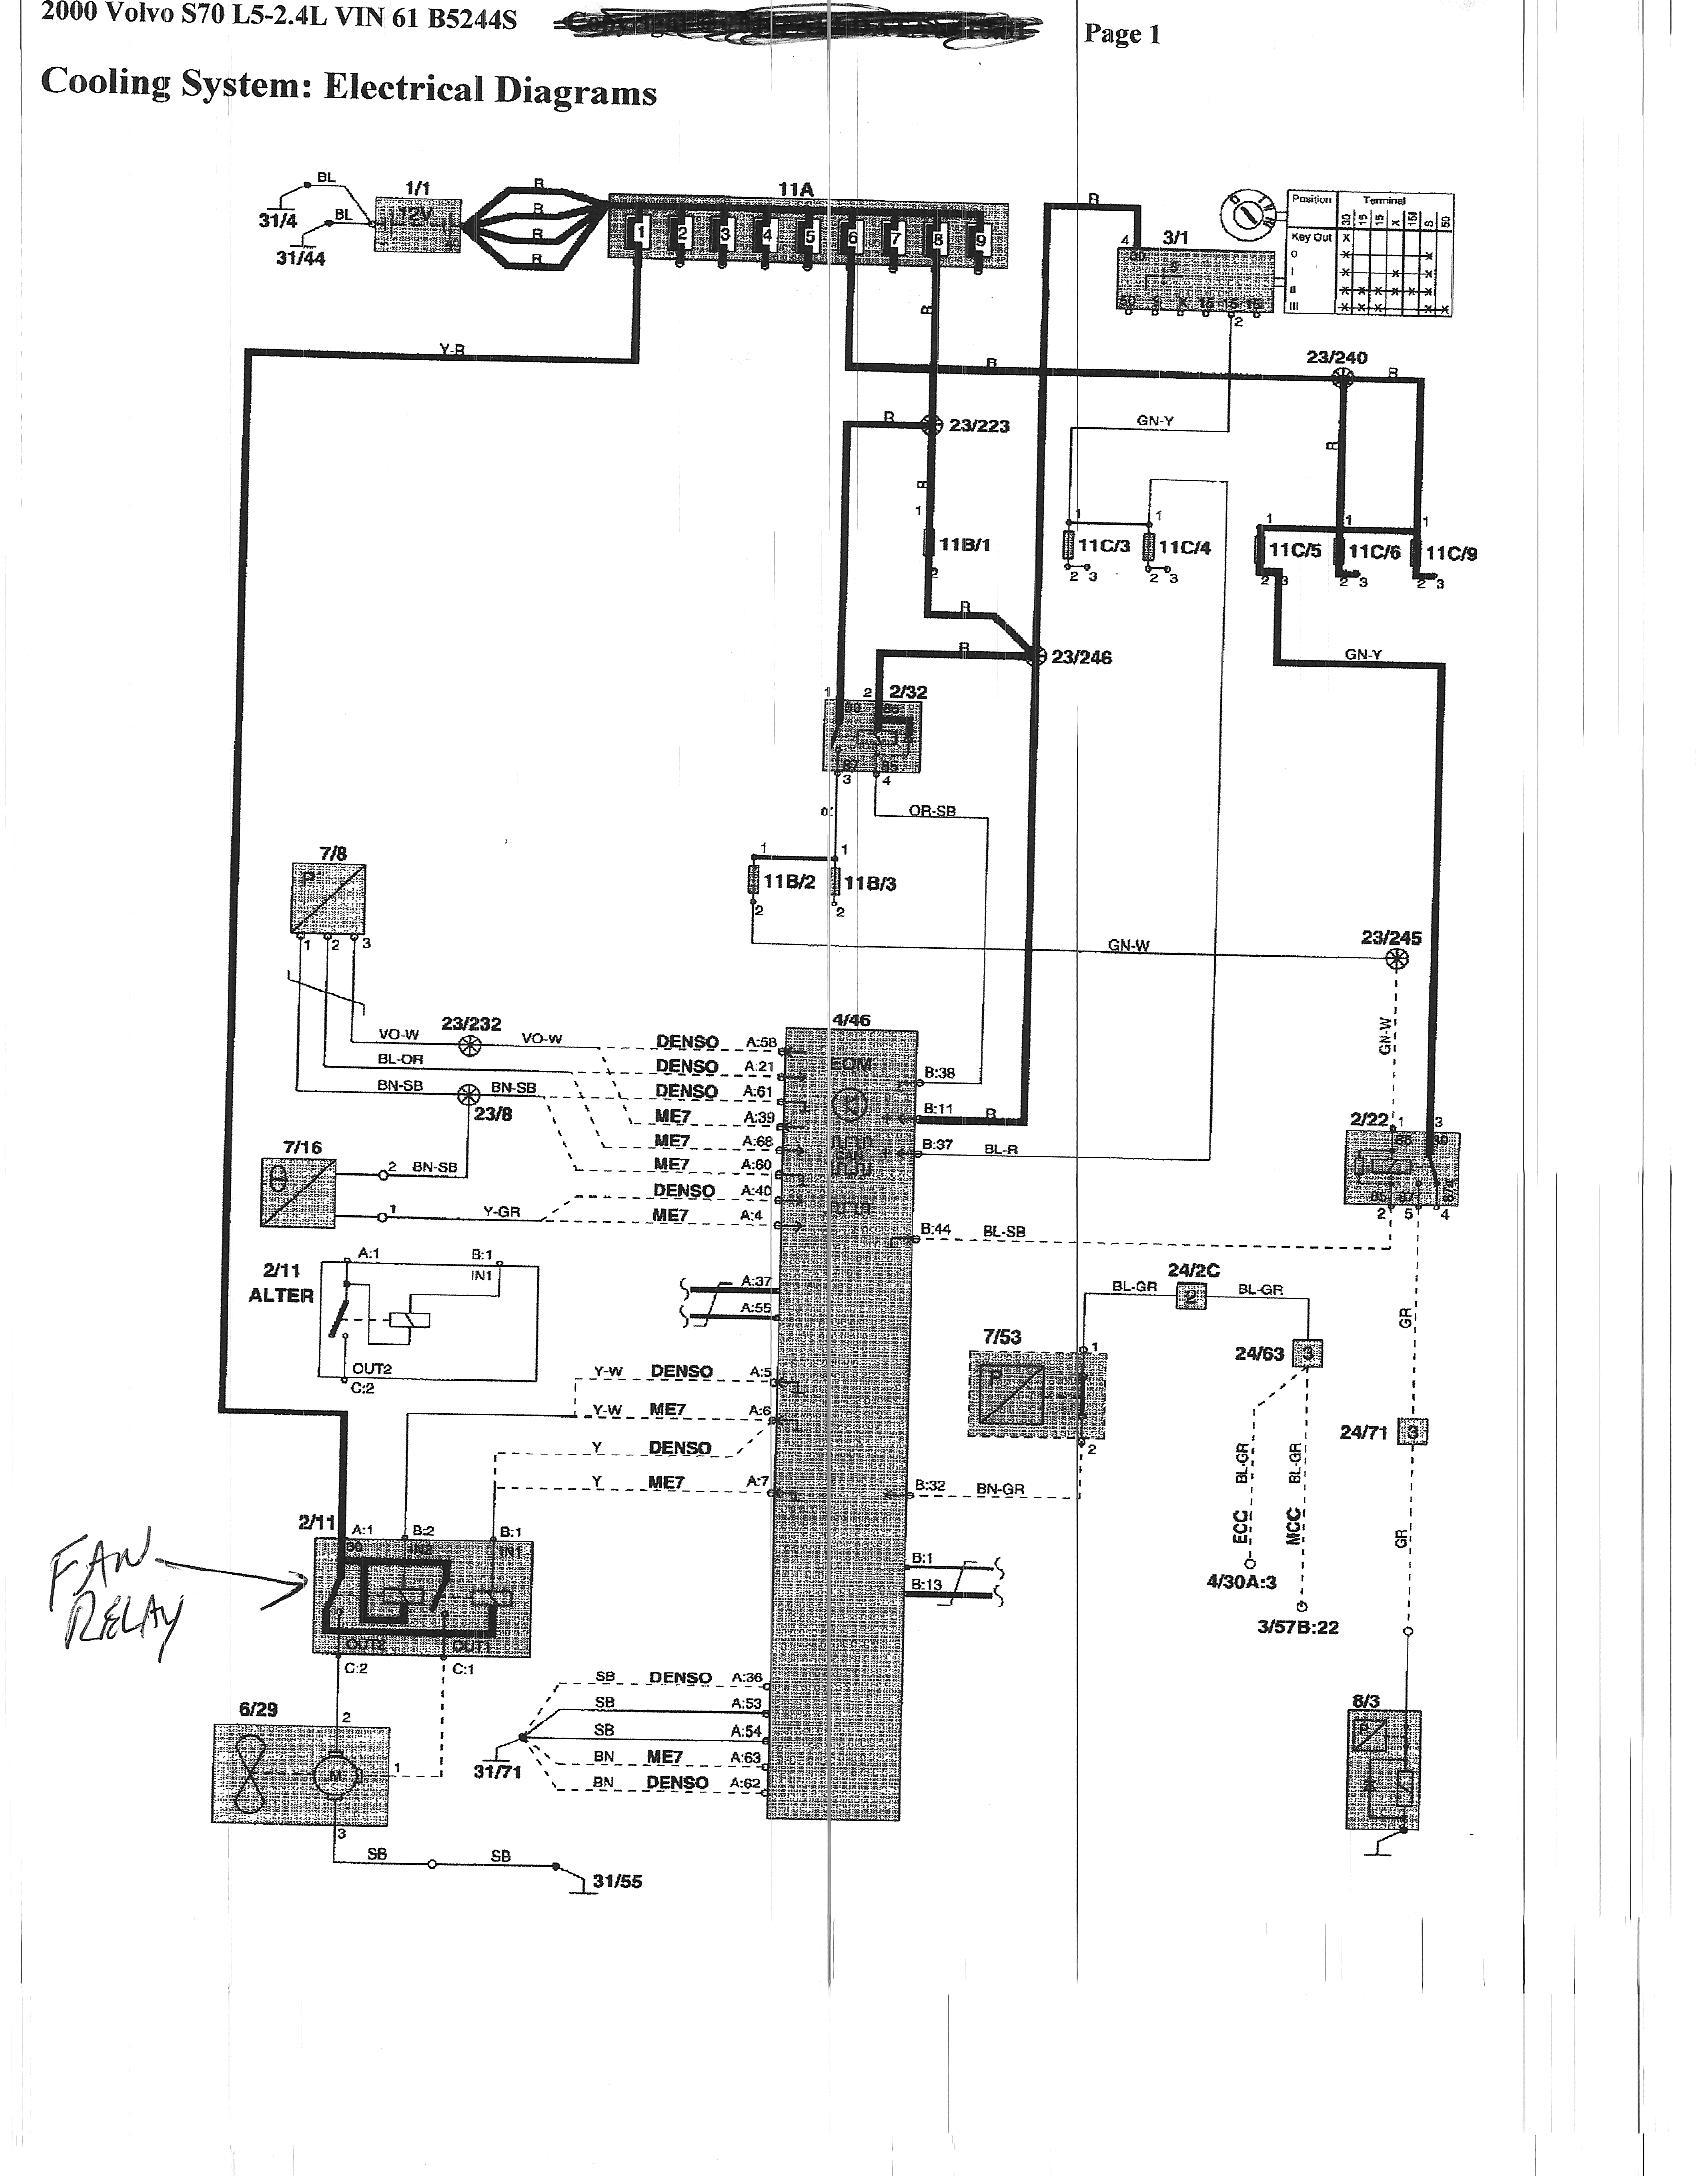 2000 Volvo S70 Fuse Diagram Schematic Diagrams 2000 Volvo S70 Alternator 2000  Volvo S70 Fuse Diagram